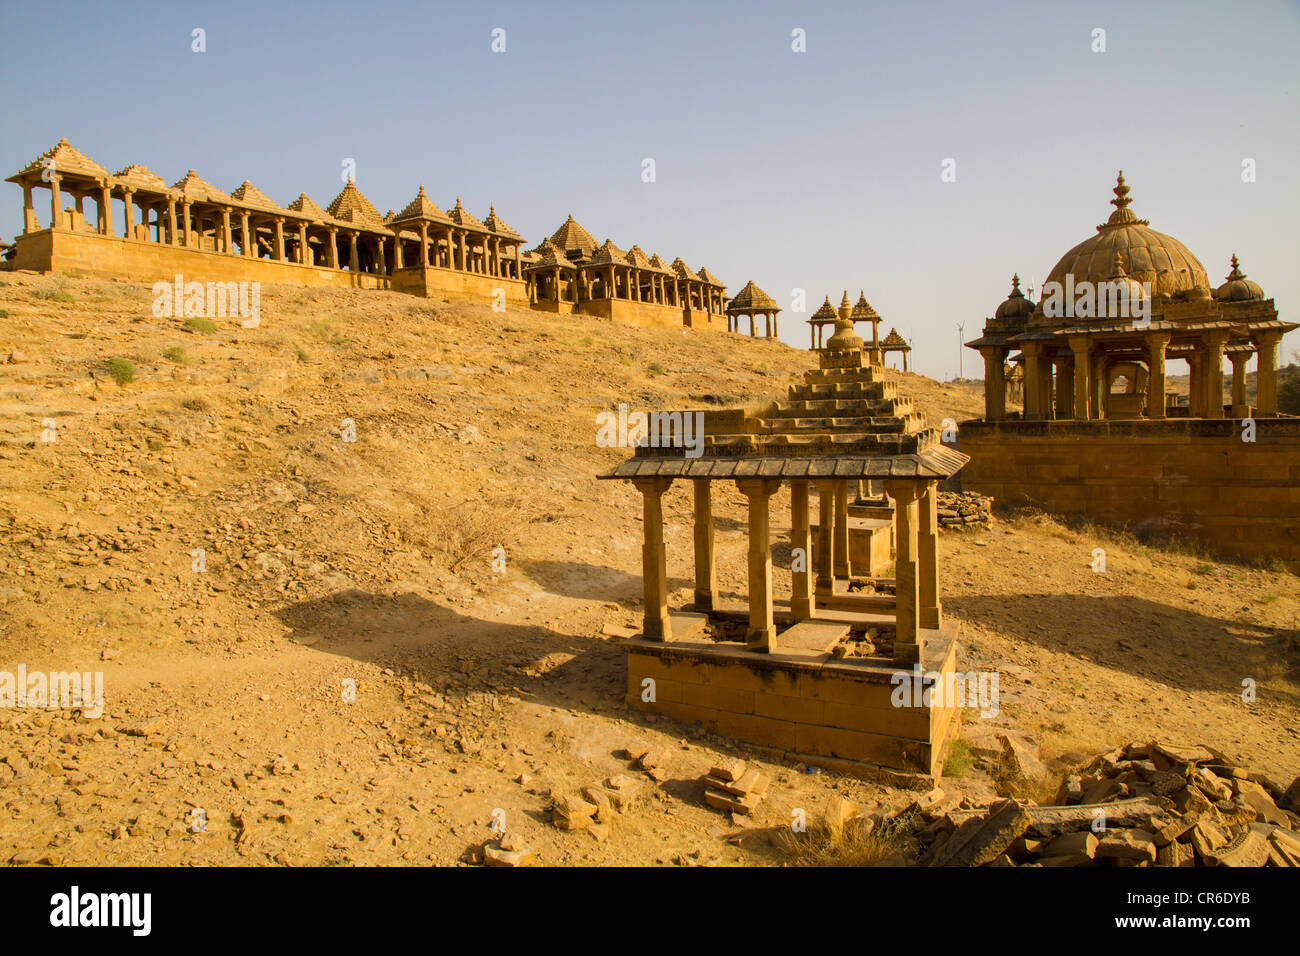 India, Rajasthan, Jaisalmer, View of Bada Bagh Cenotaphs - Stock Image